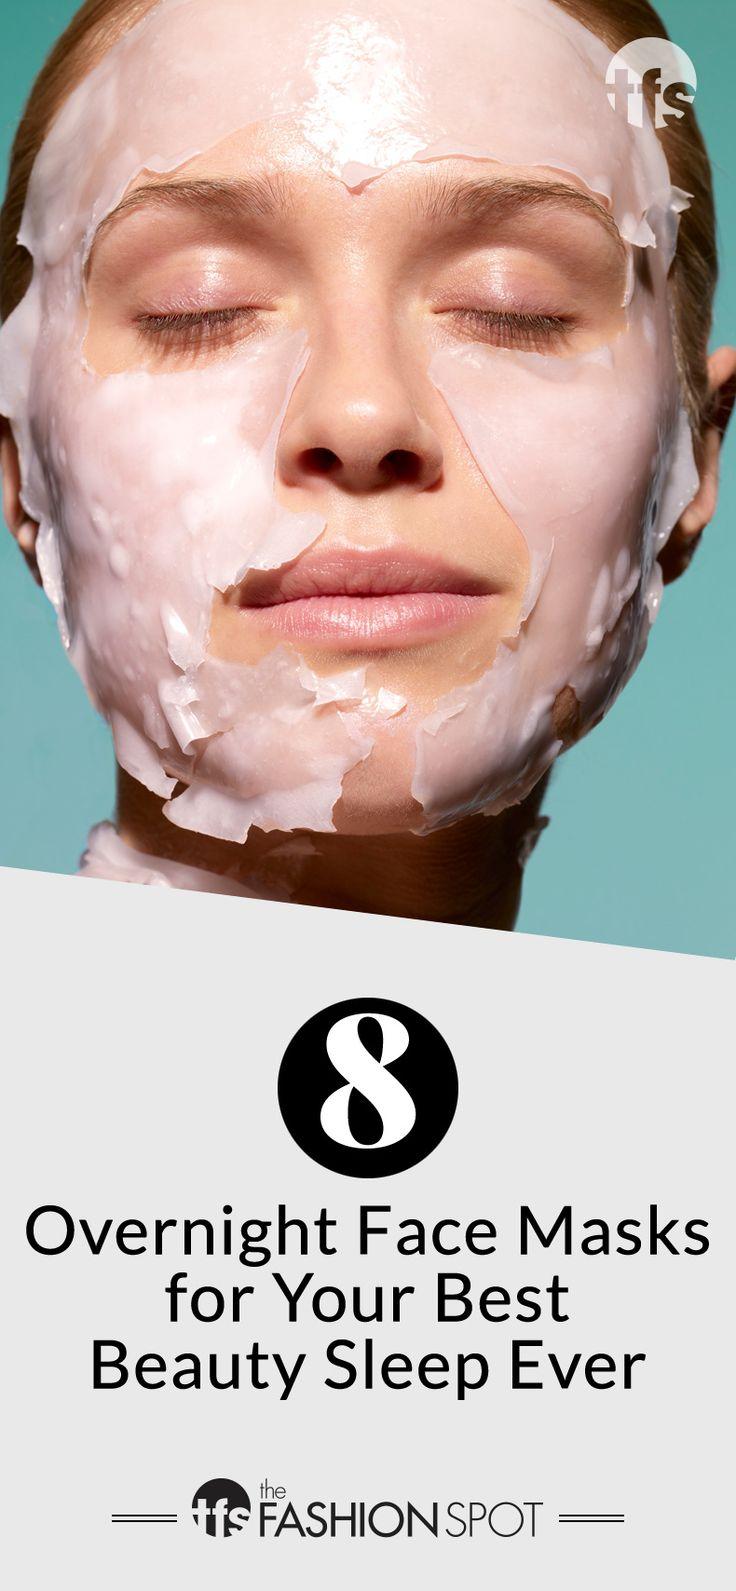 8 Overnight Face Masks for the Best Beauty Sleep Ever